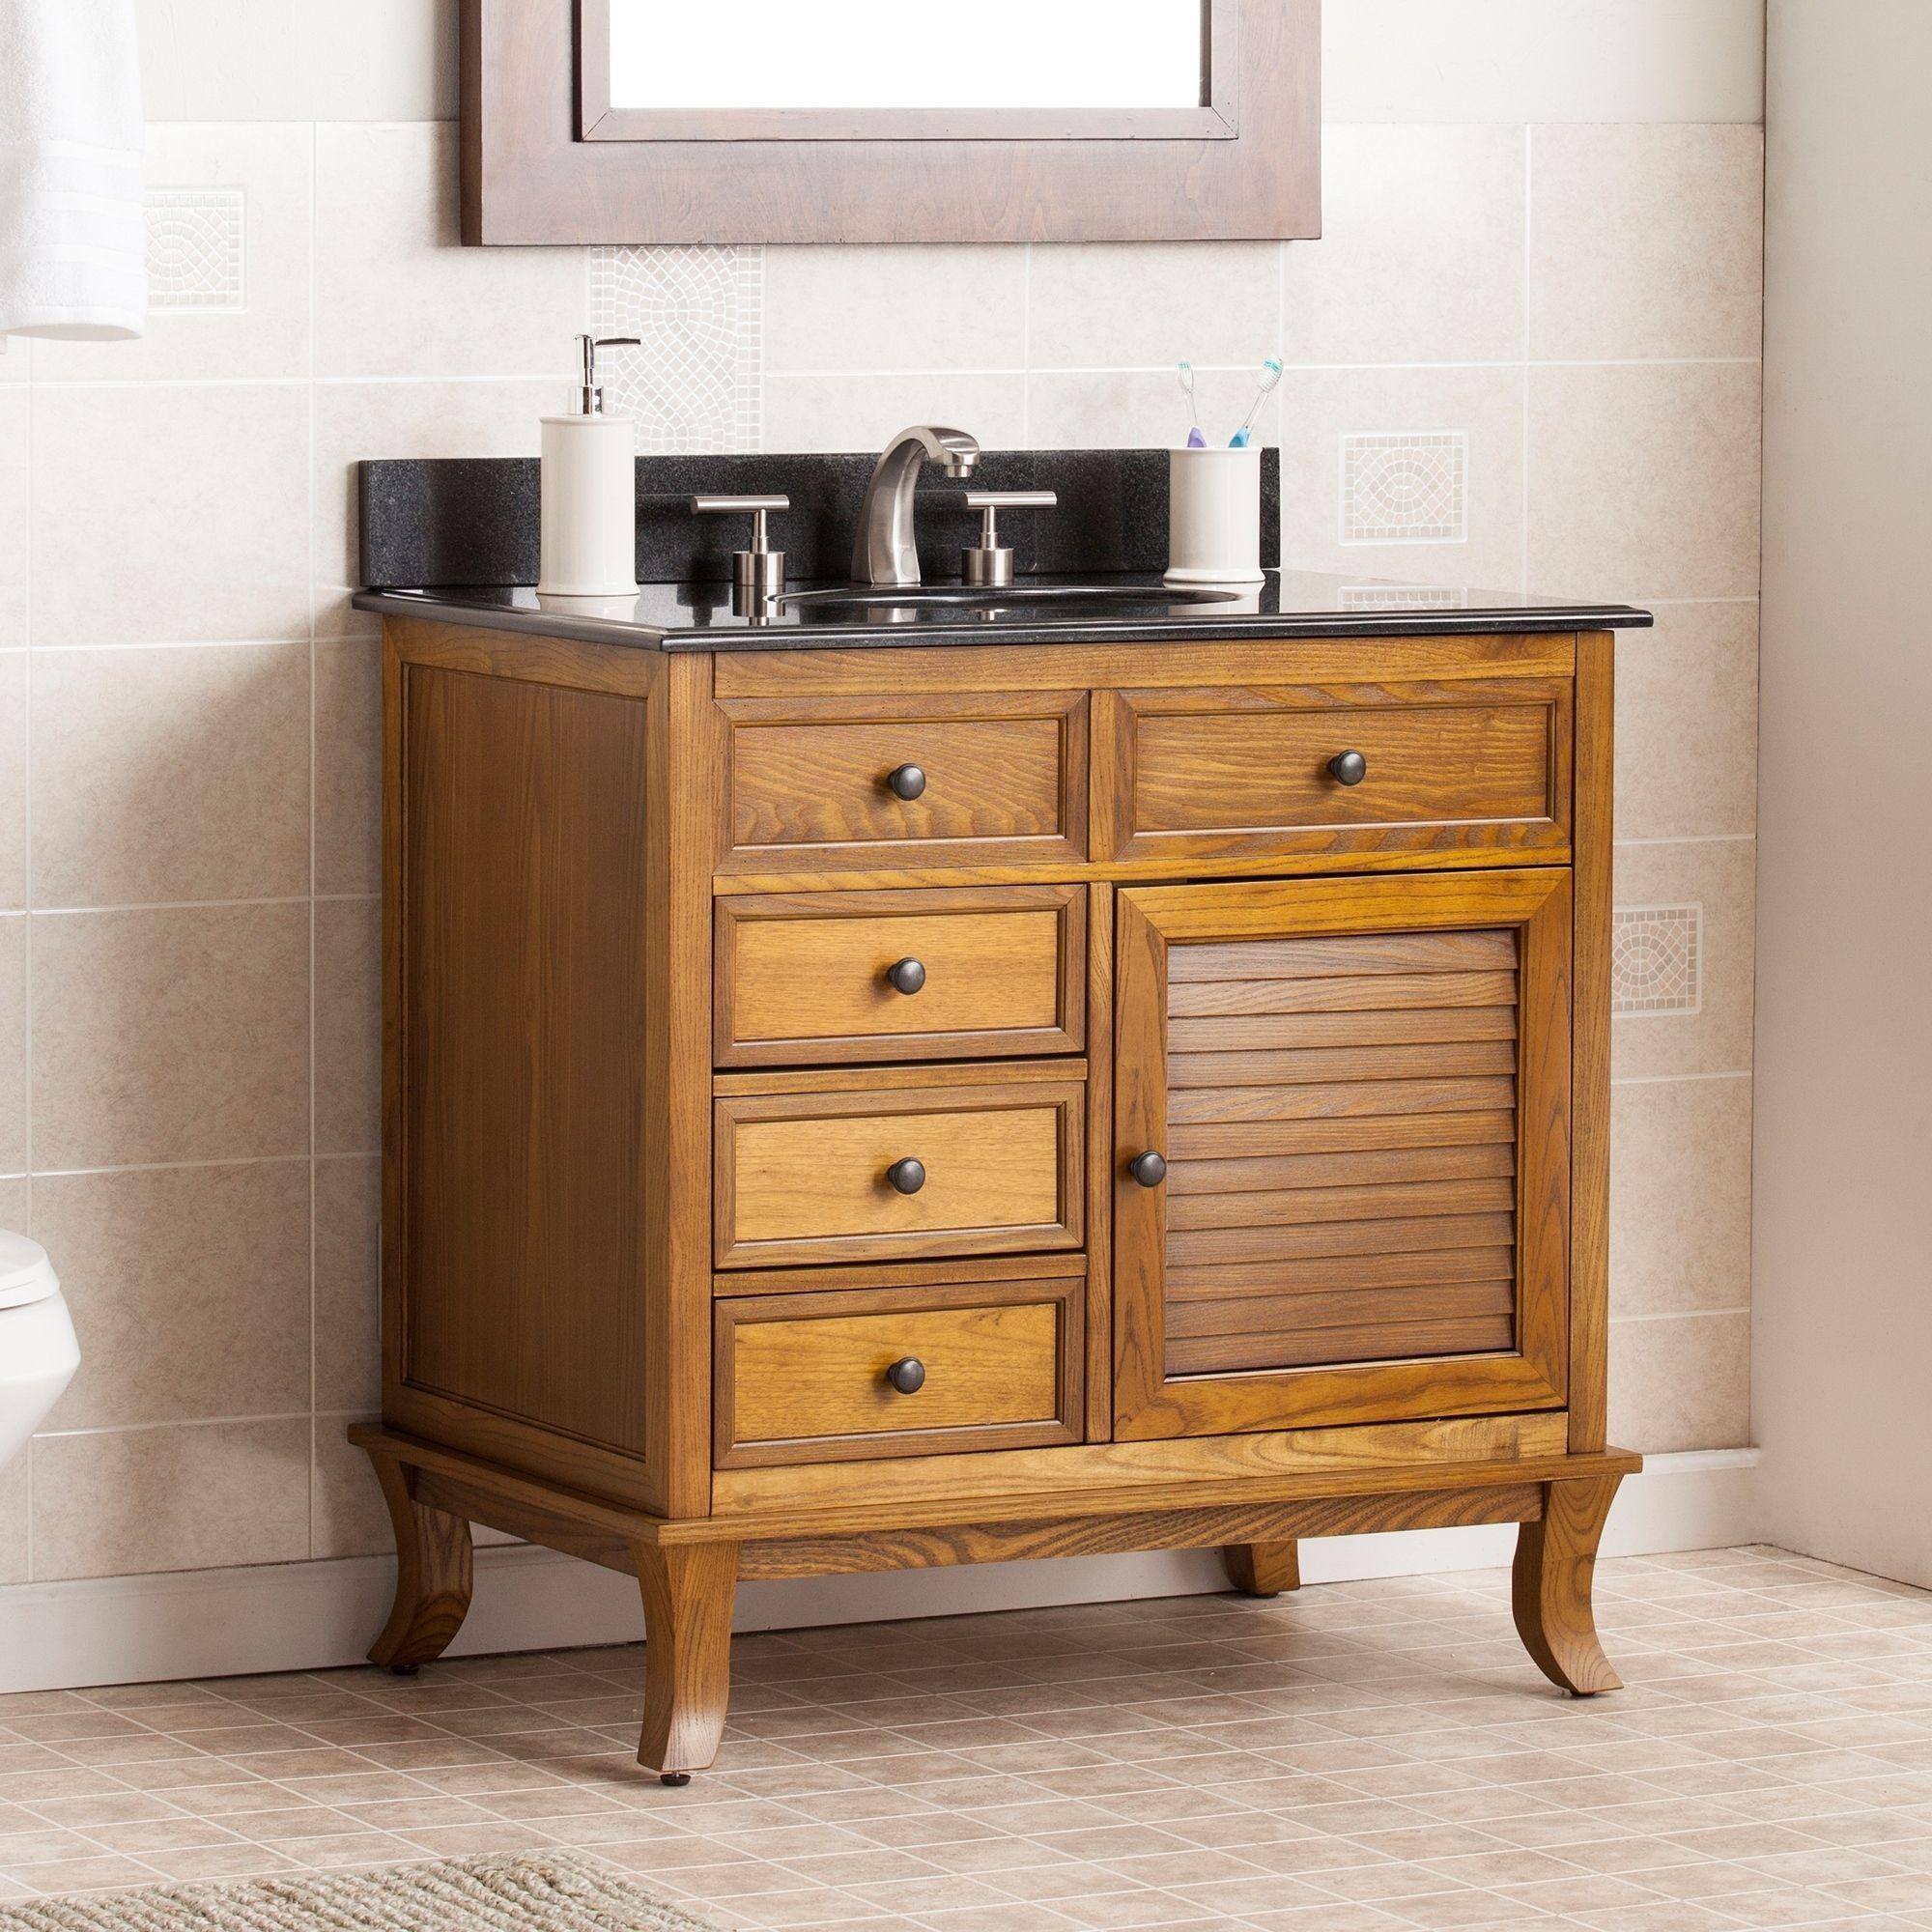 Overstock Com Online Shopping Bedding Furniture Electronics Jewelry Clothing More Vanity Weathered Oak Single Bathroom Vanity